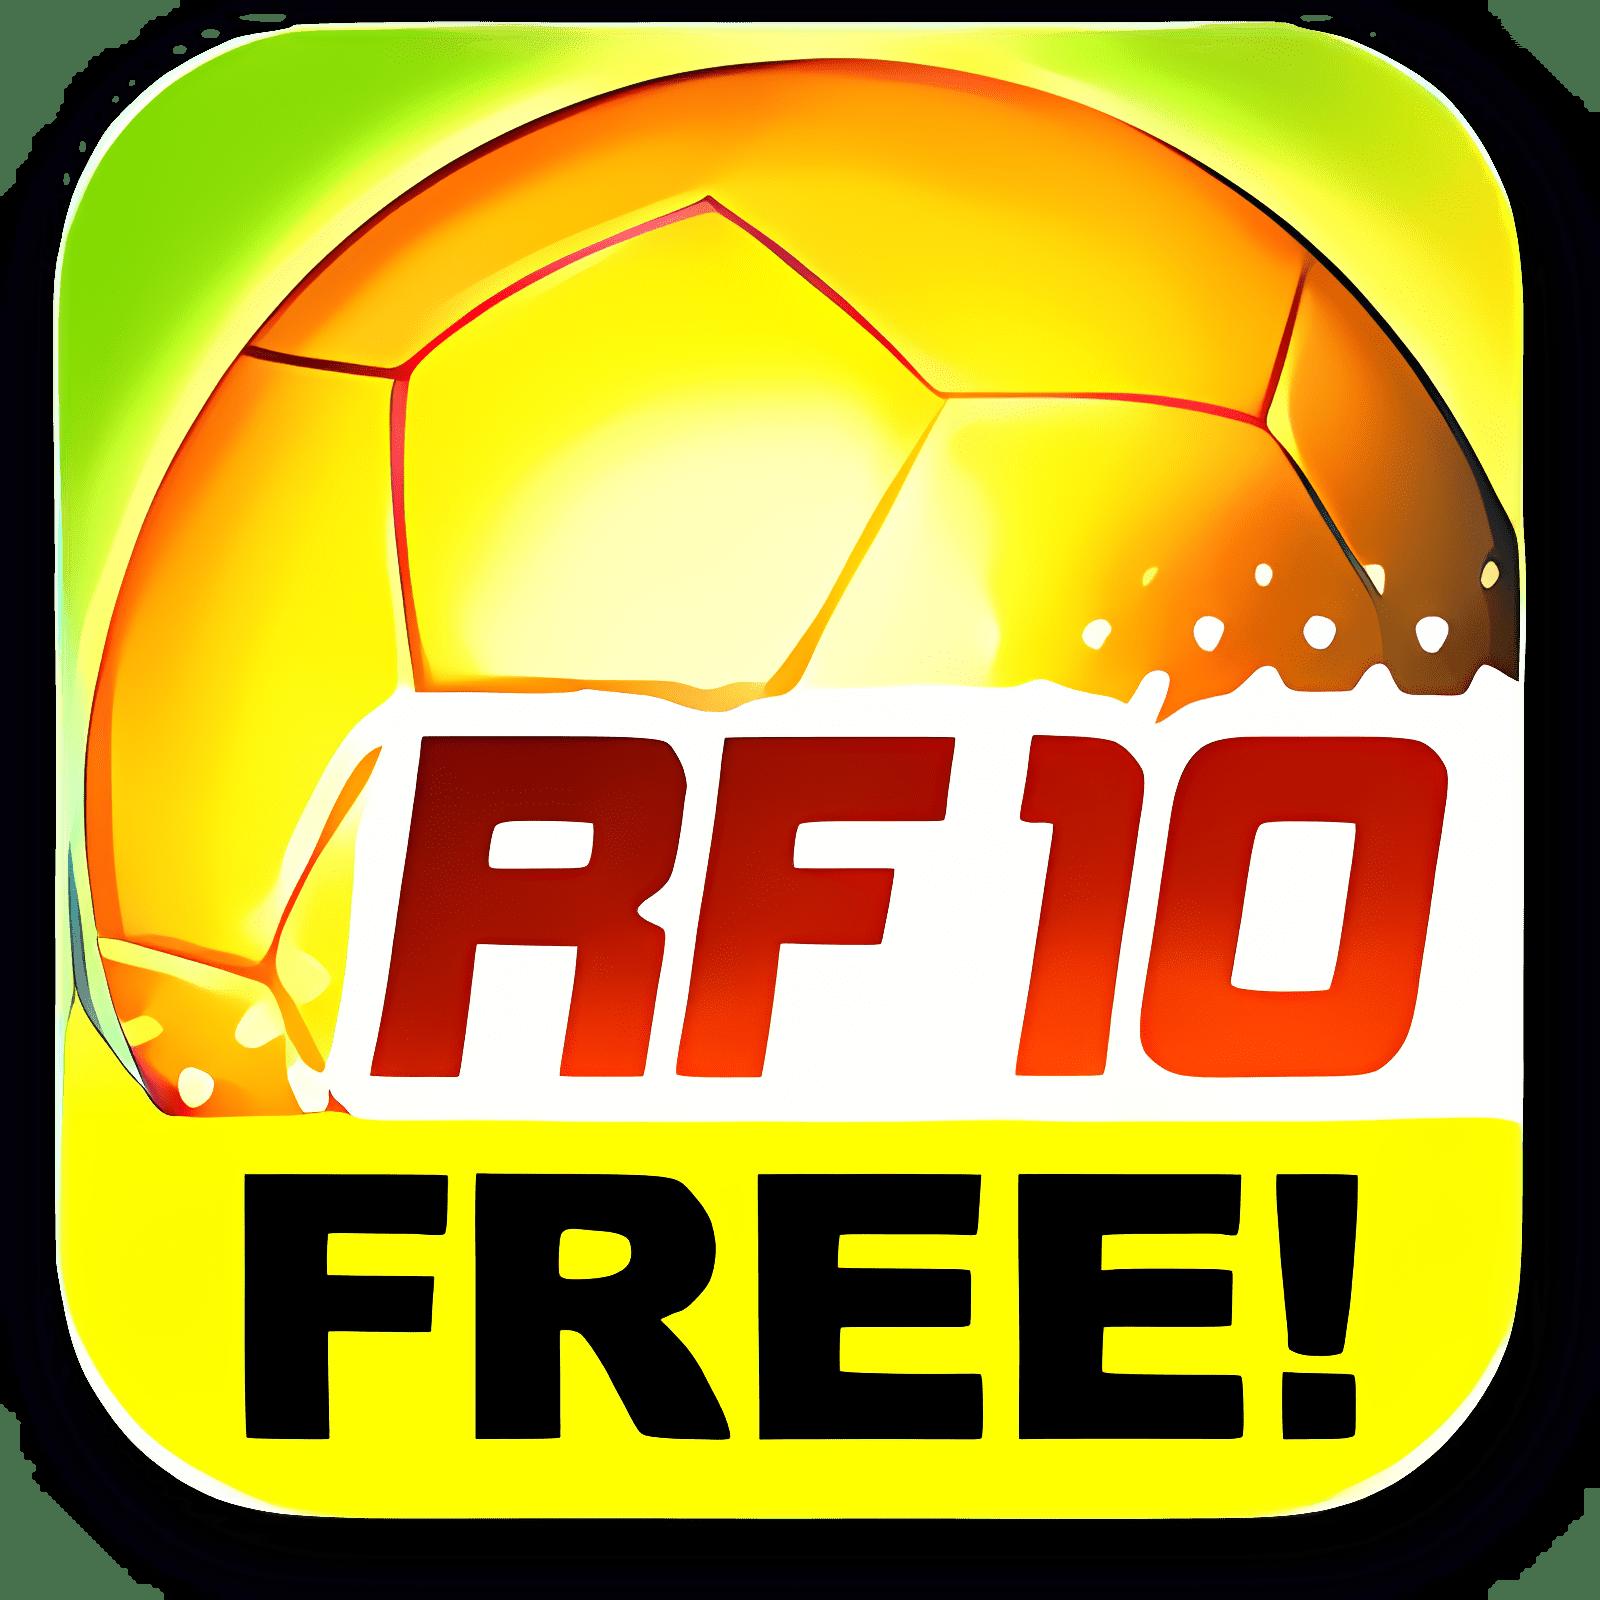 Real Football 2010 Free 1.0.9